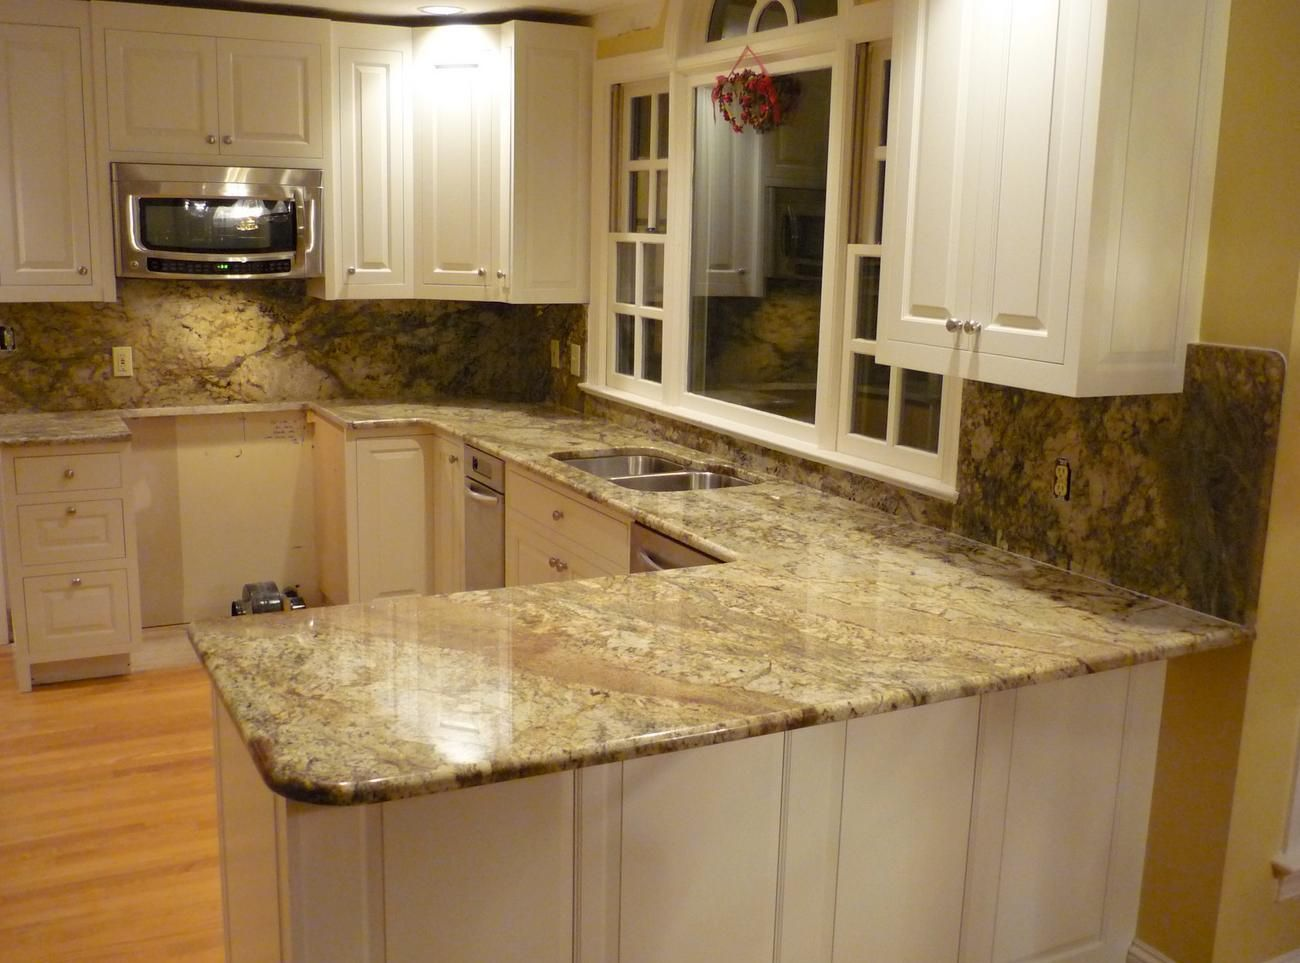 Granite Countertops By Mogastone Kitchen Countertops Laminate Kitchen Countertops Home Depot Countertops